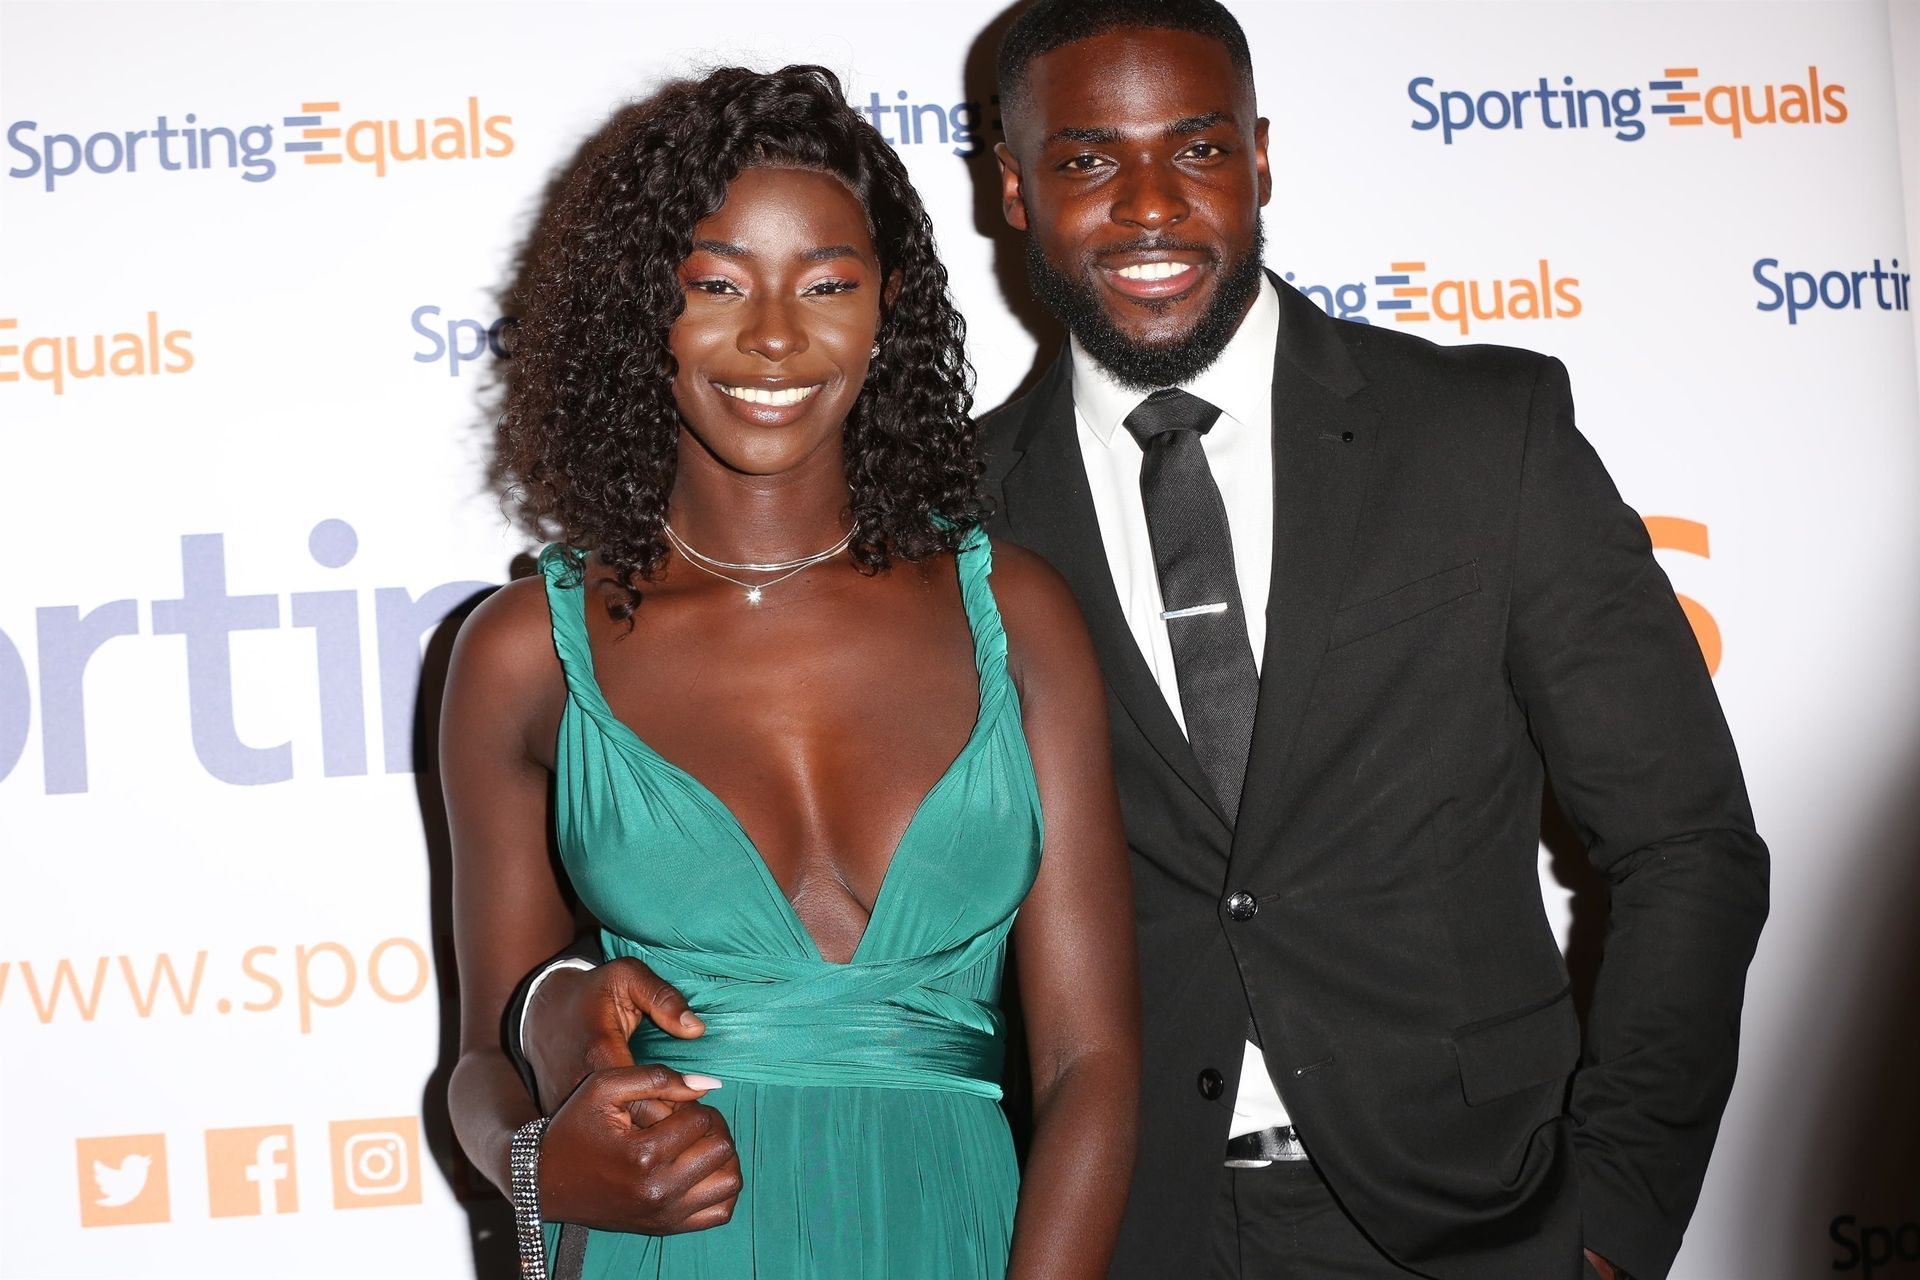 Mike Boateng & Priscilla Anyabu Are Seen At British Ethnic Diversity Sports Awards 0092